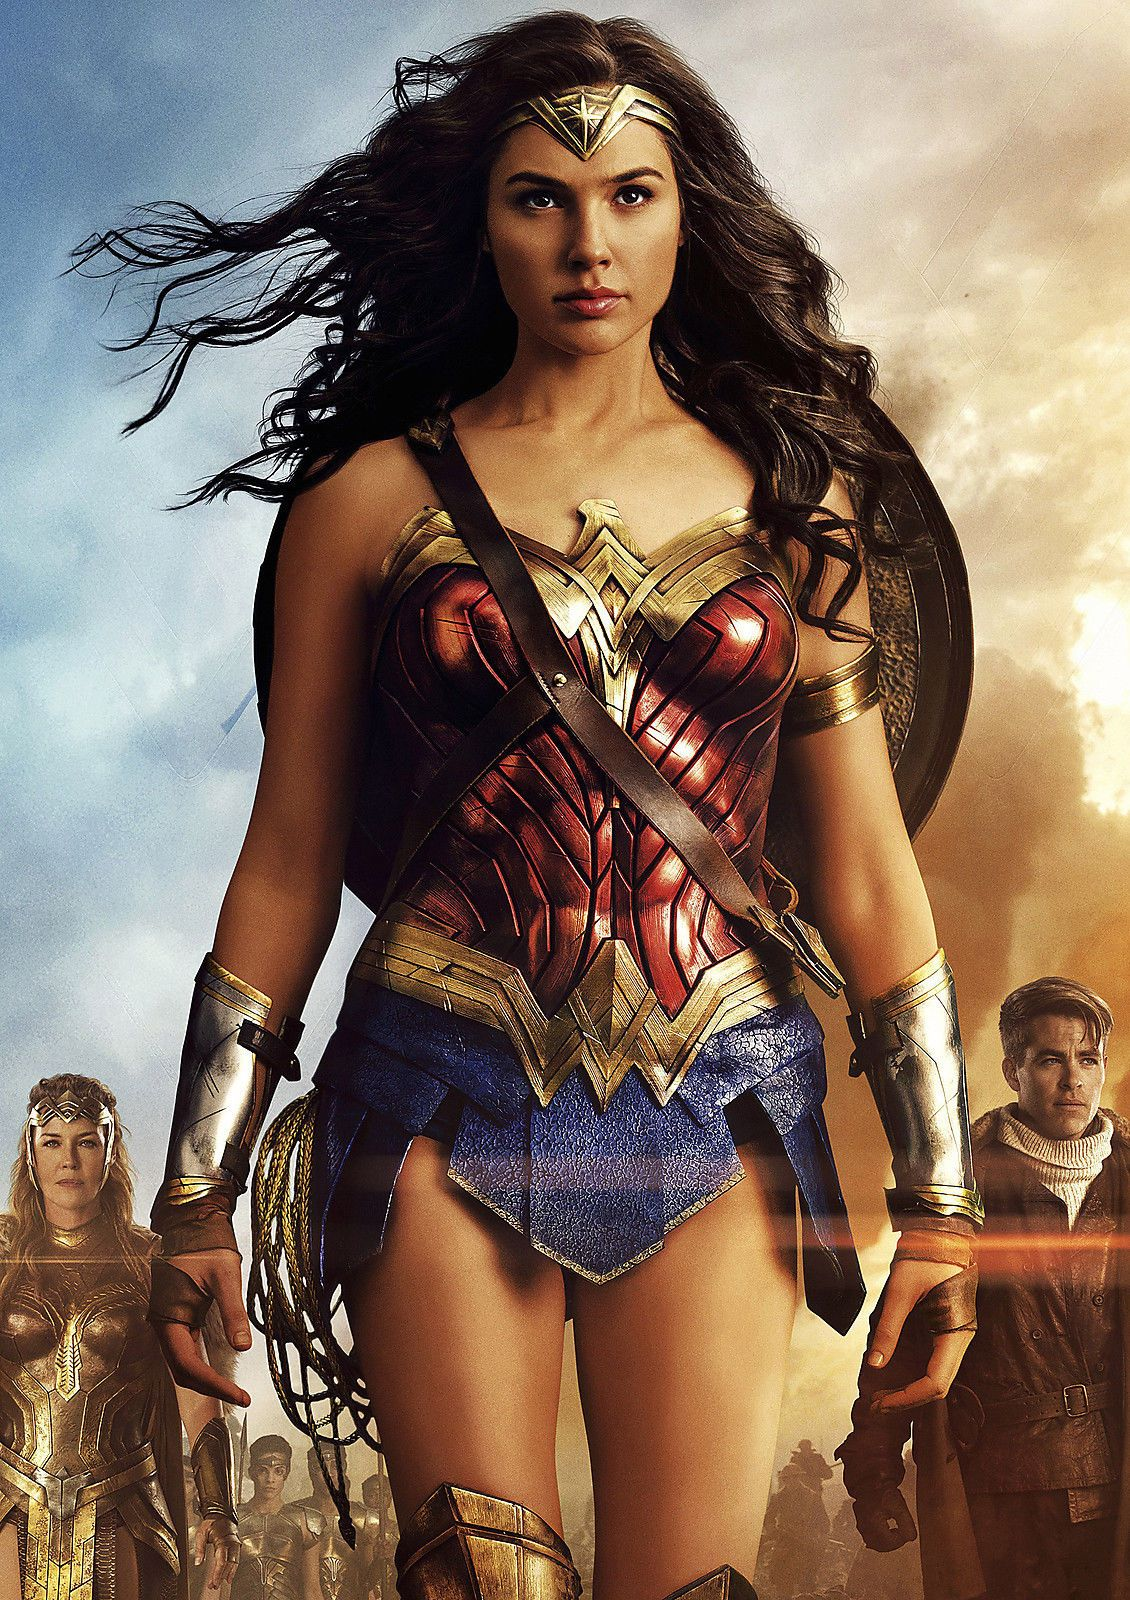 2 Gbp Gal Gadot 24 Wonder Woman Art Print Mugs And Photo Prints Ebay Collectibles Wonder Woman Art Wonder Woman Movie Gal Gadot Wonder Woman